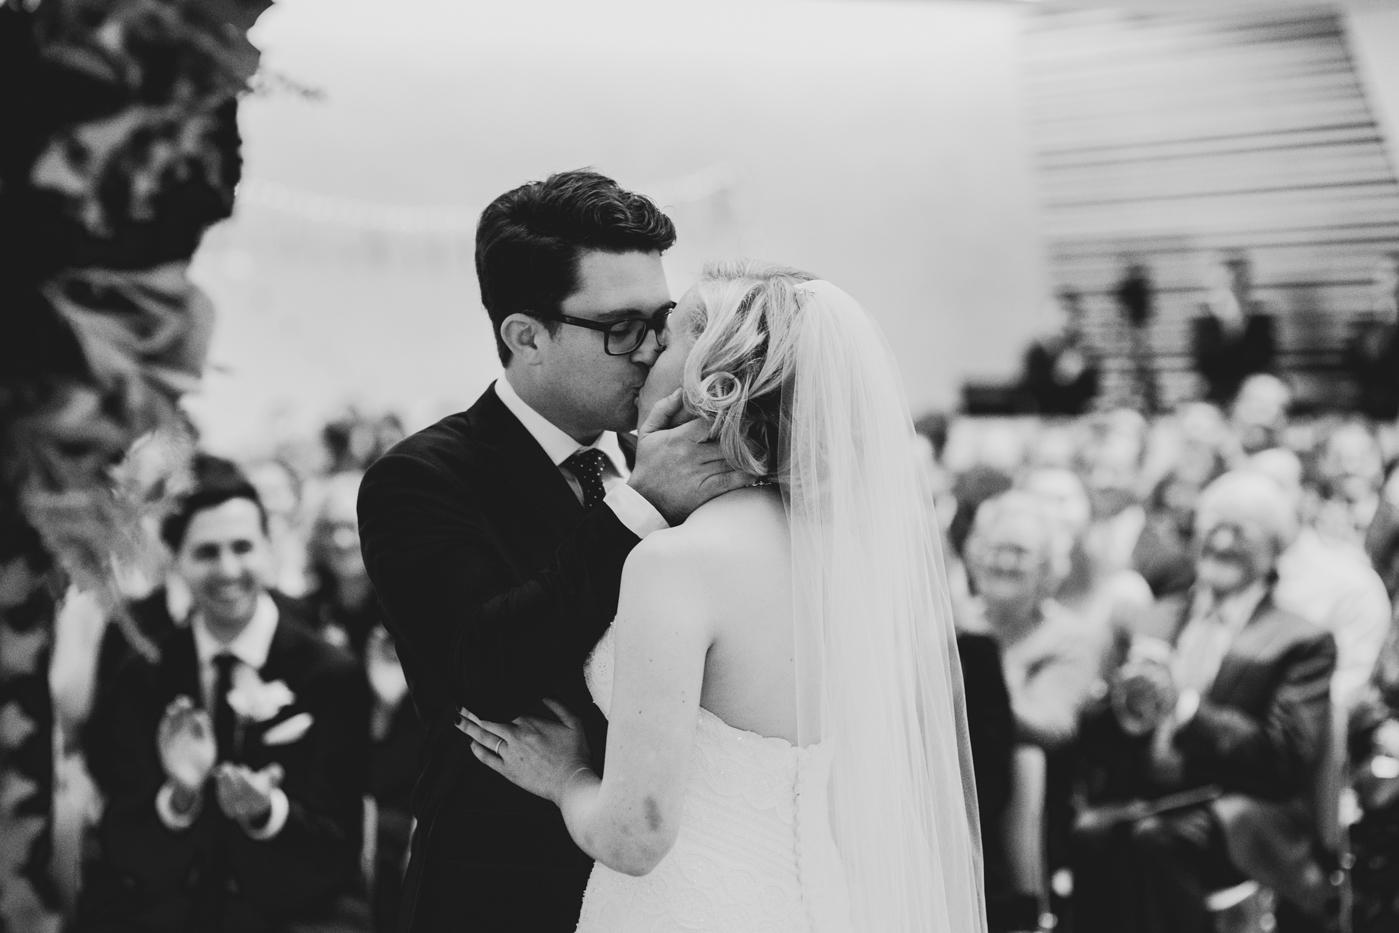 Jo & Tom Wedding - The Grounds of Alexandria - Samantha Heather Photography-126.jpg